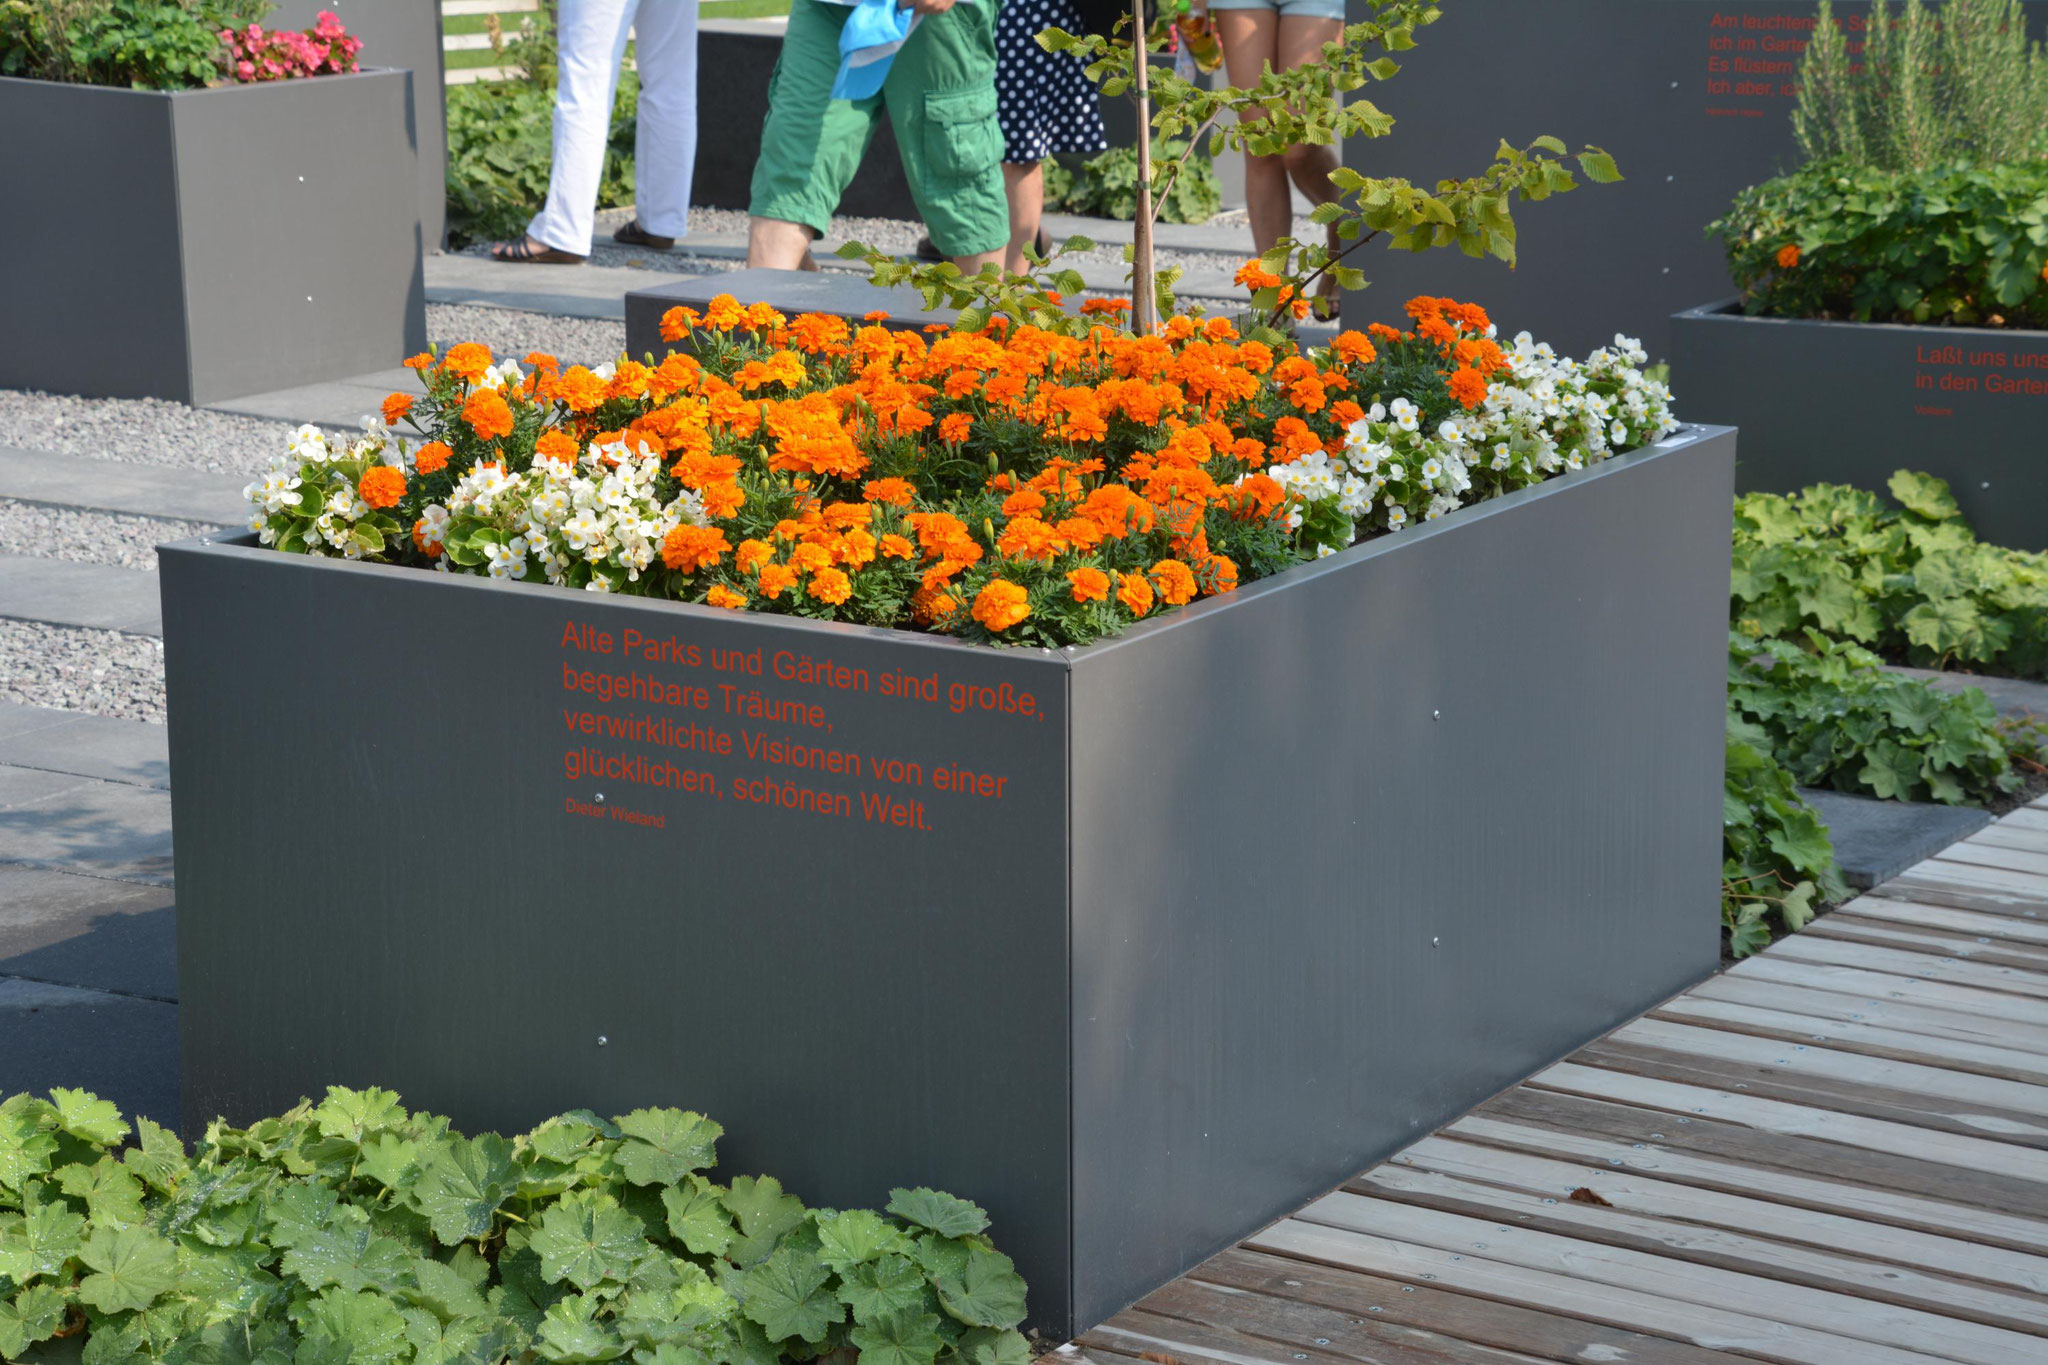 Full Size of Hochbeet Edelstahl Urban Metallmoebel24 Garten Edelstahlküche Gebraucht Outdoor Küche Wohnzimmer Hochbeet Edelstahl